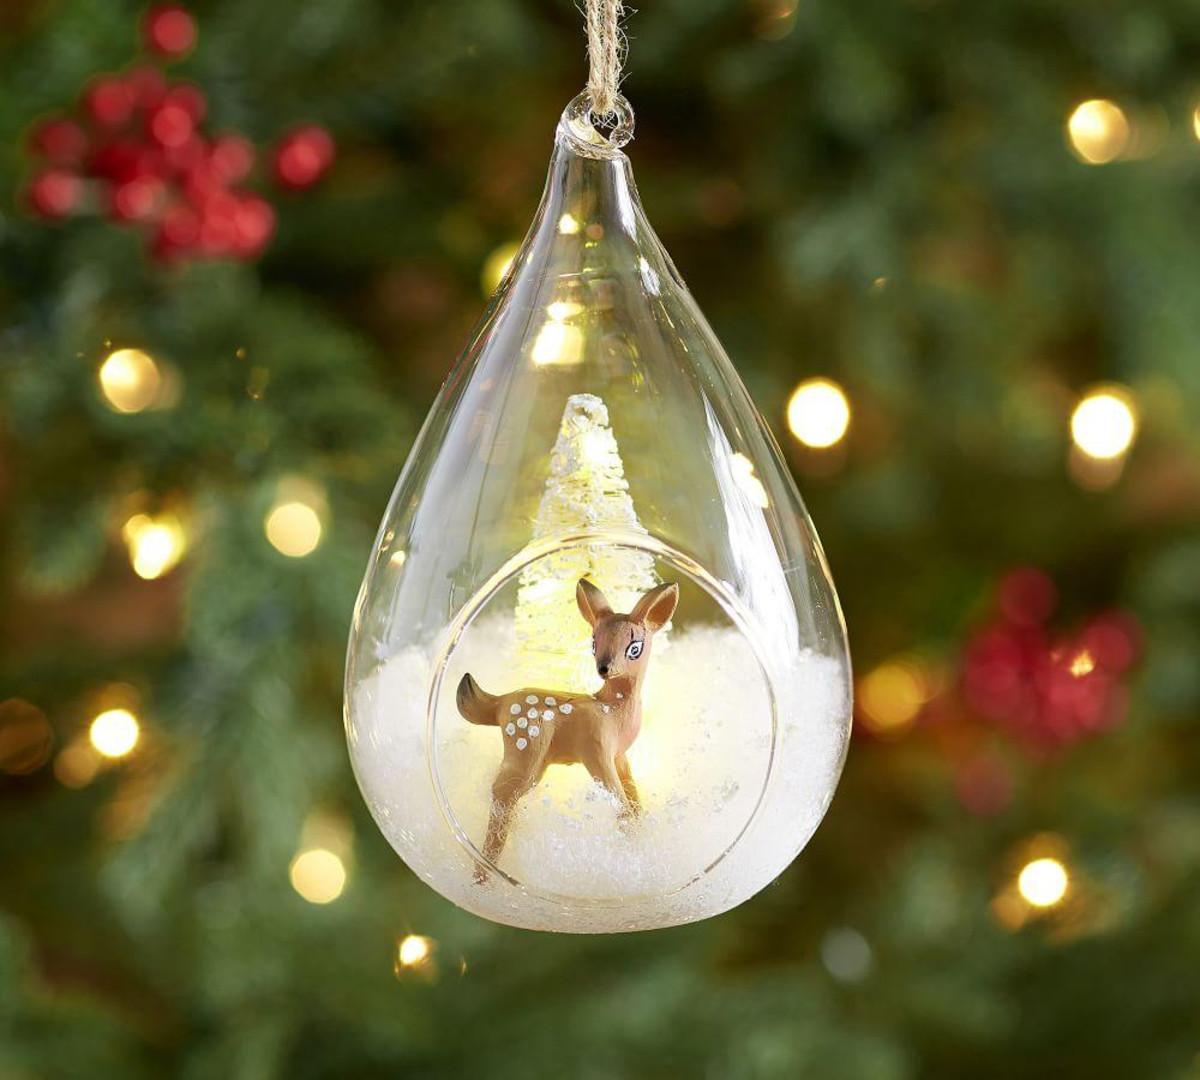 Lit Reindeer Ornament